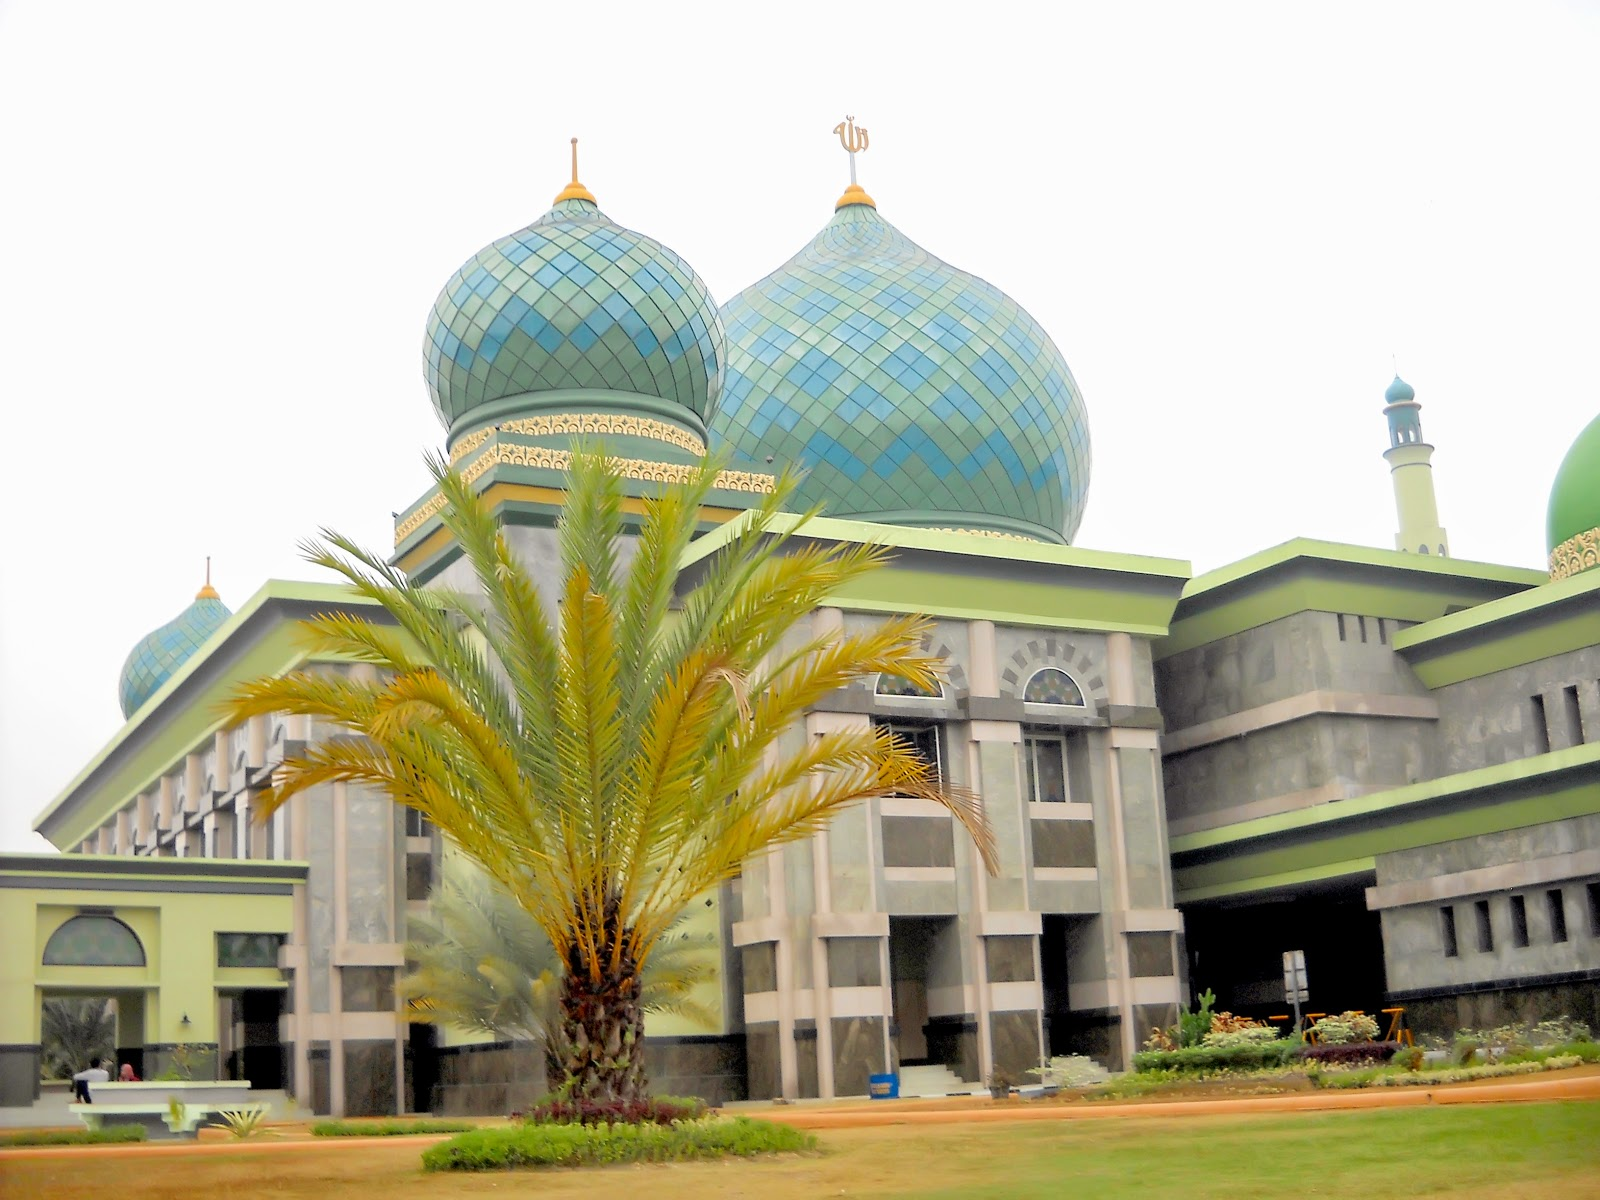 Berbagi Pengetahuan Bersama Sc2 Art Photo Masjid Agung Nur Pekanbaru